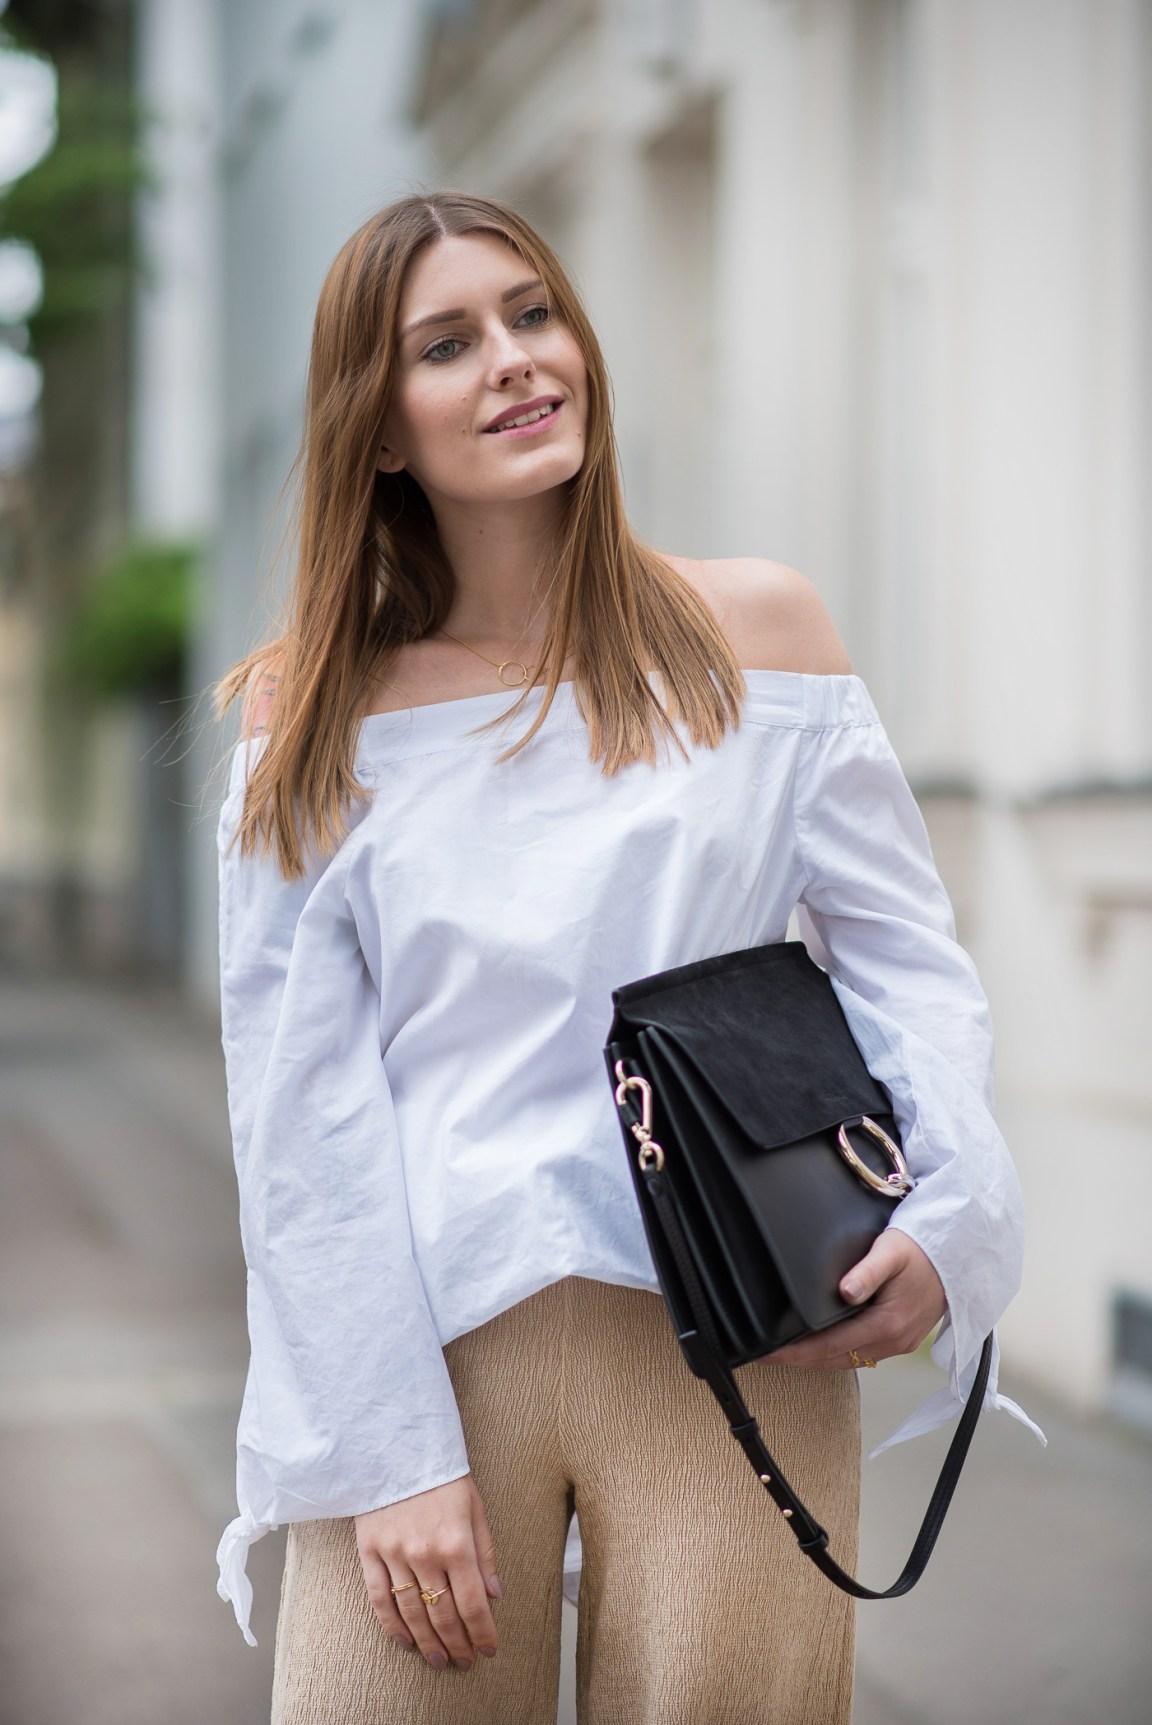 Culotte_&_Platforms_Outfit_6